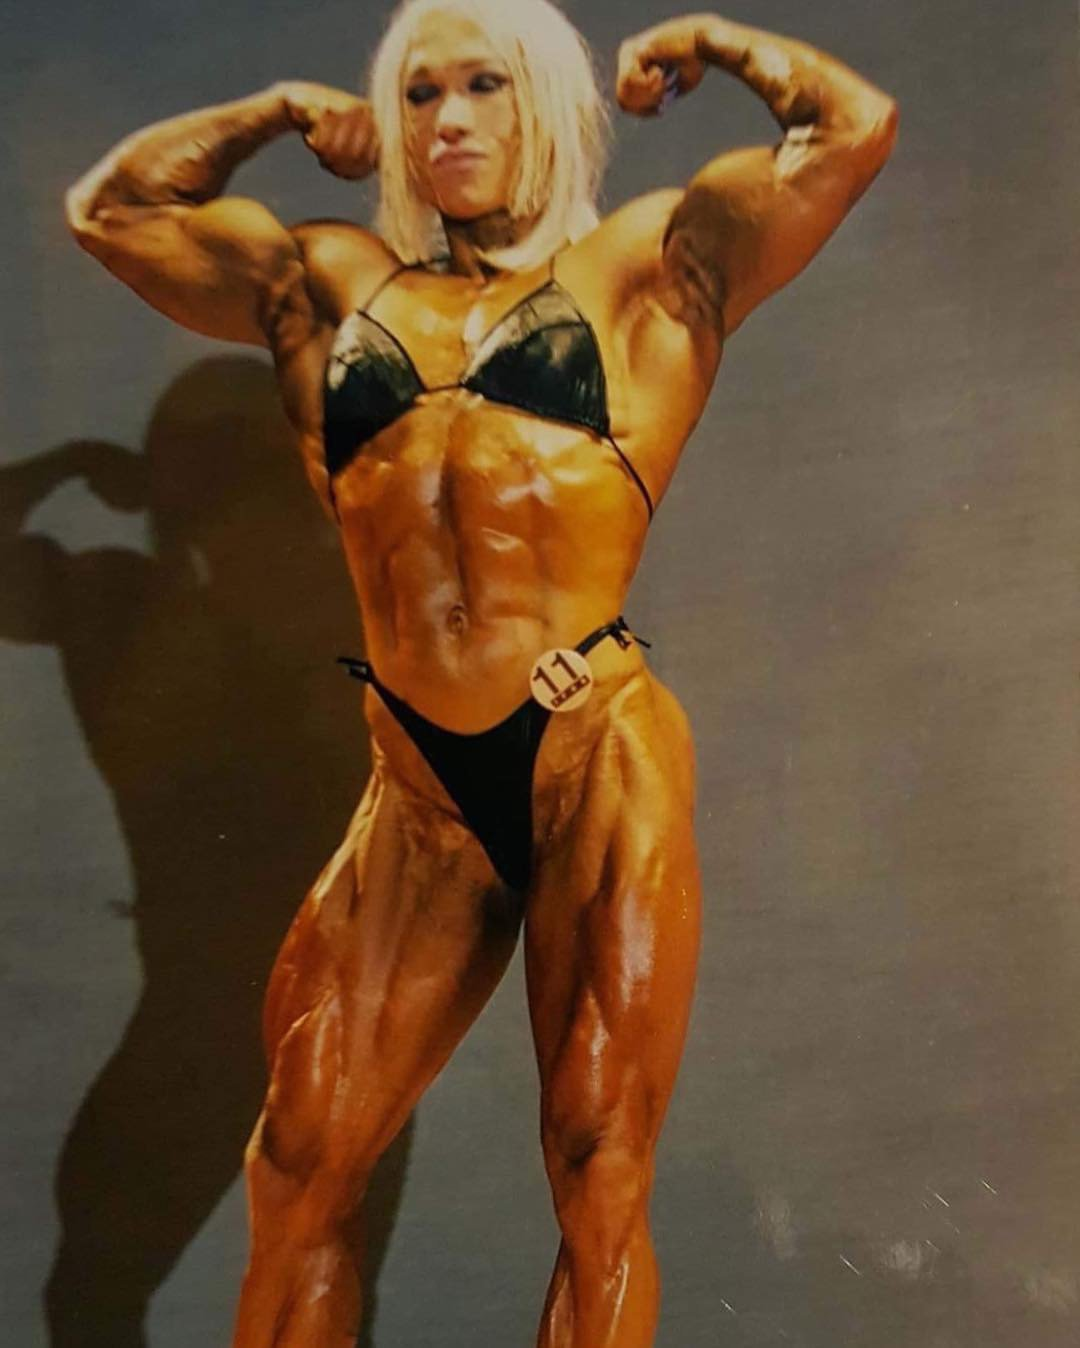 Inna Uit- ex world champion in womens bodybuilding - Media